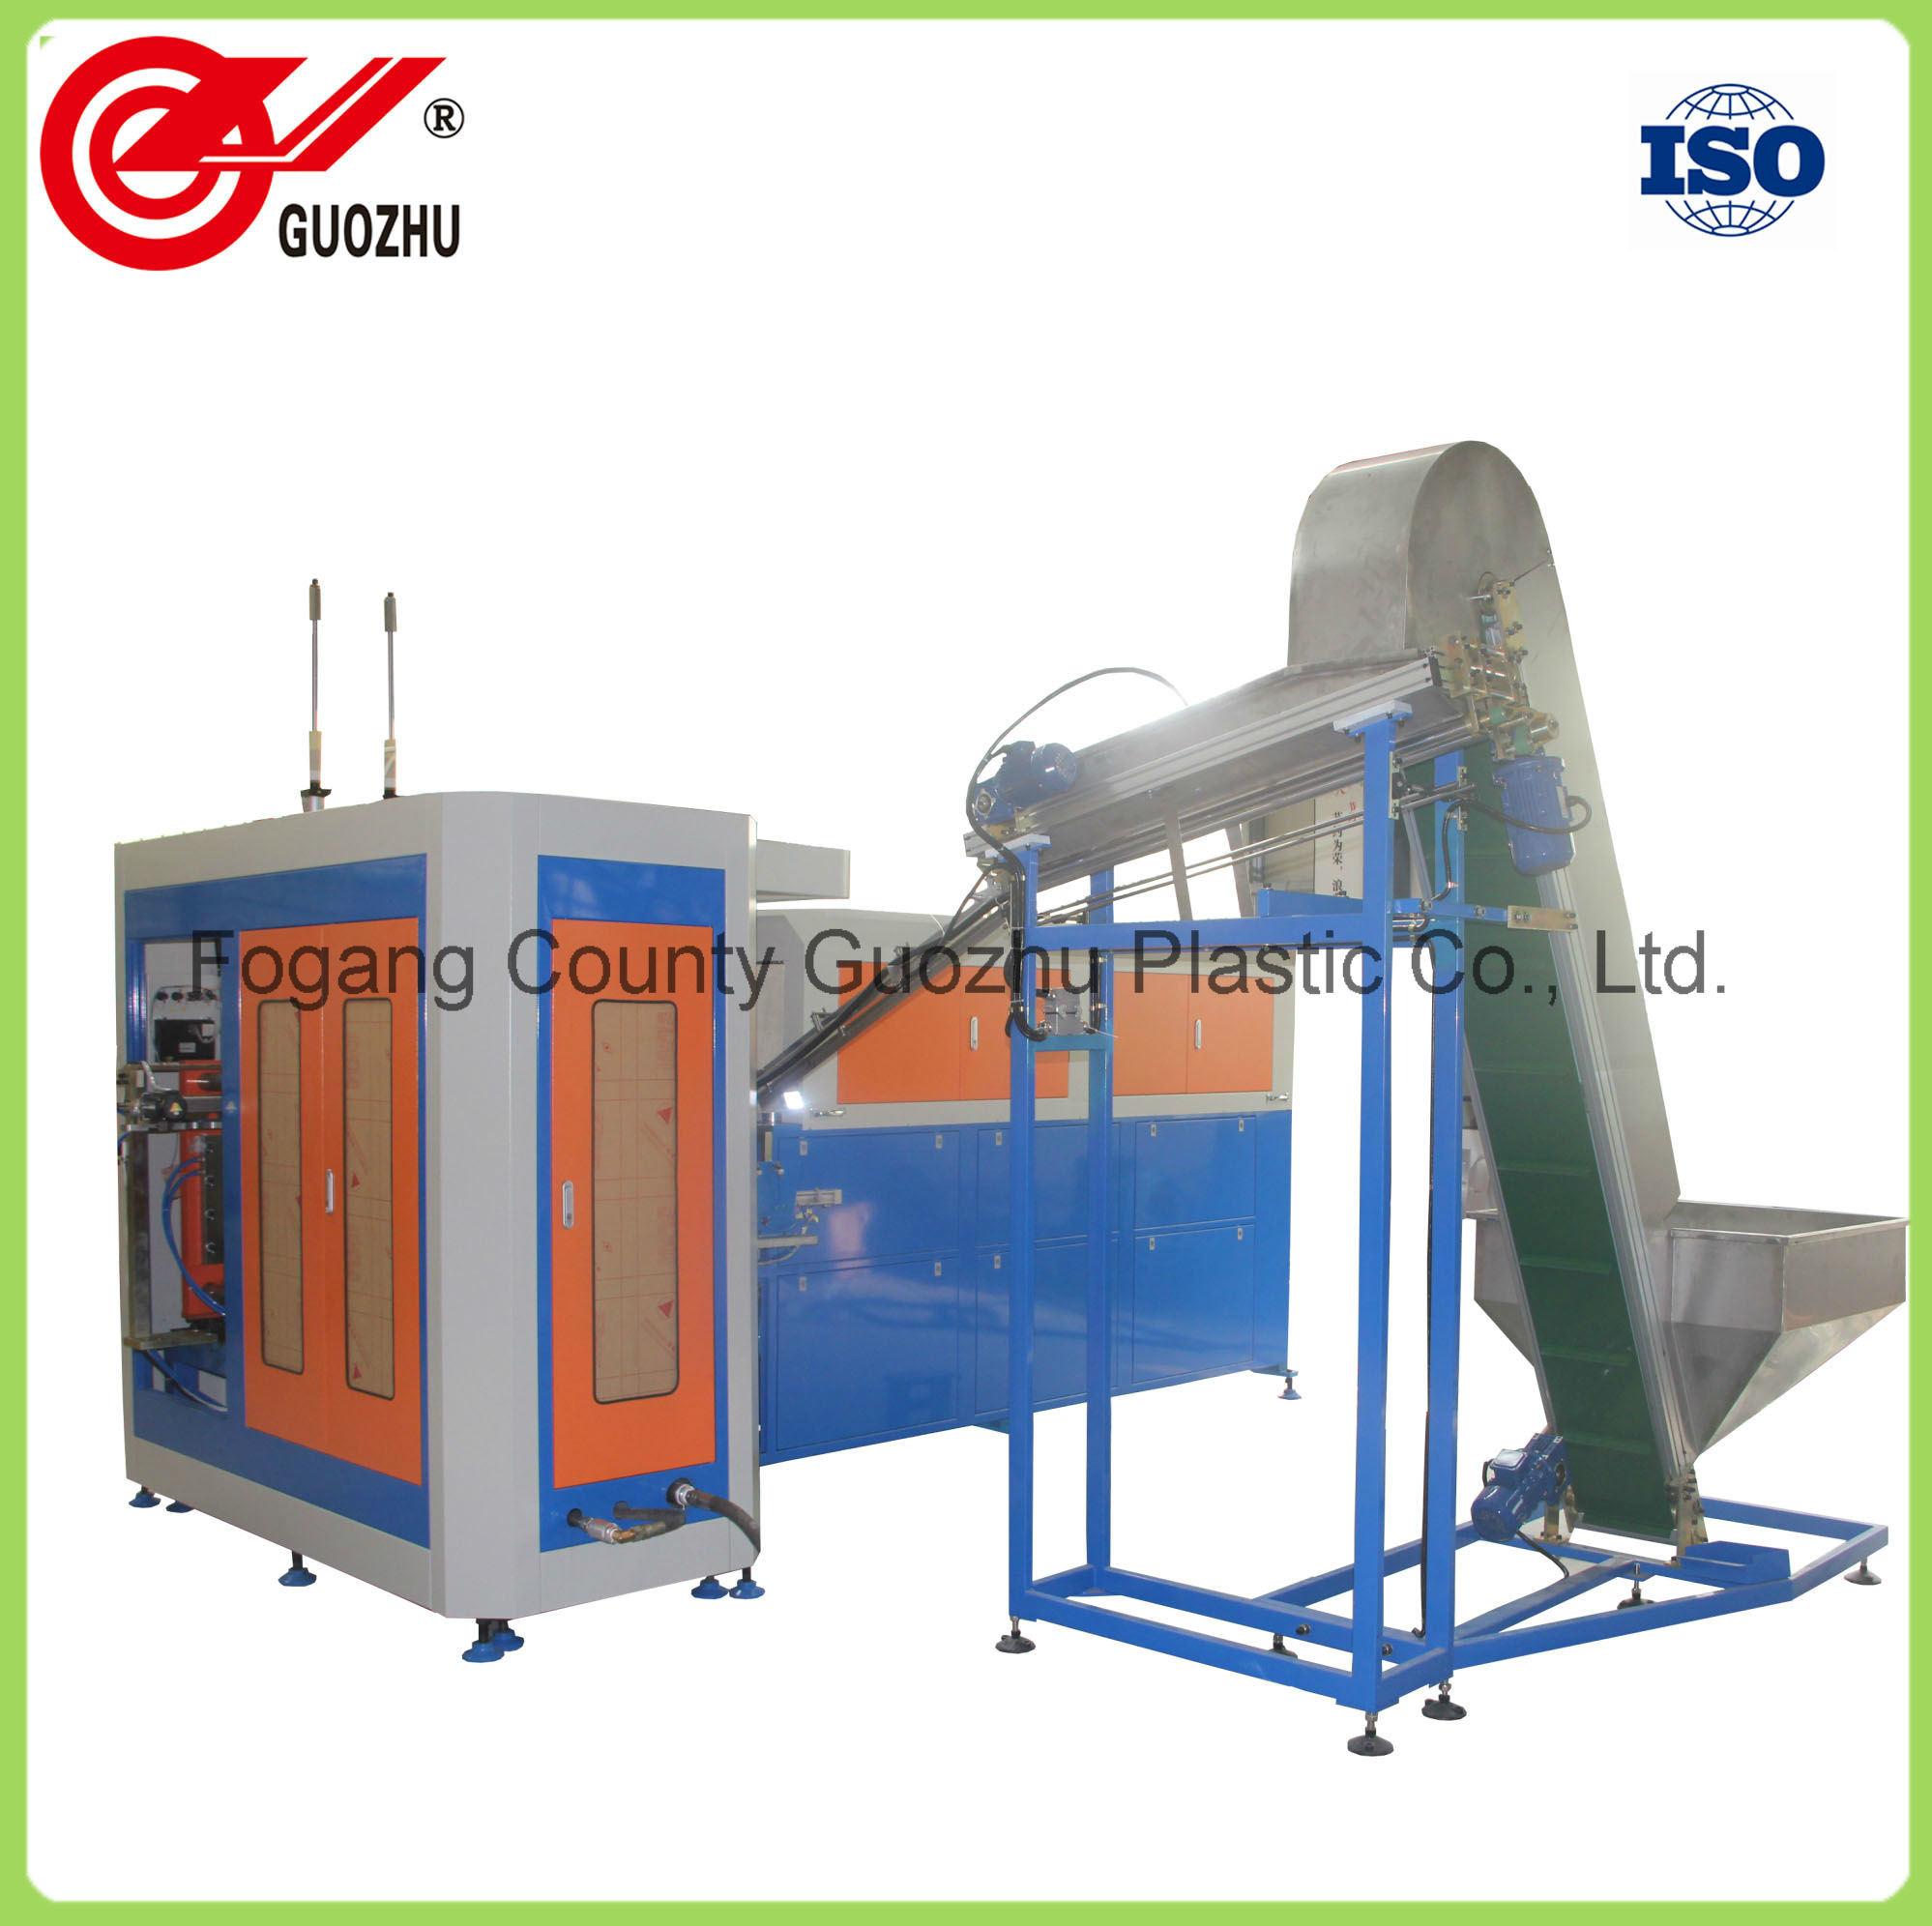 5L 6 Cavity Automatic Linear Blow Molding Machine